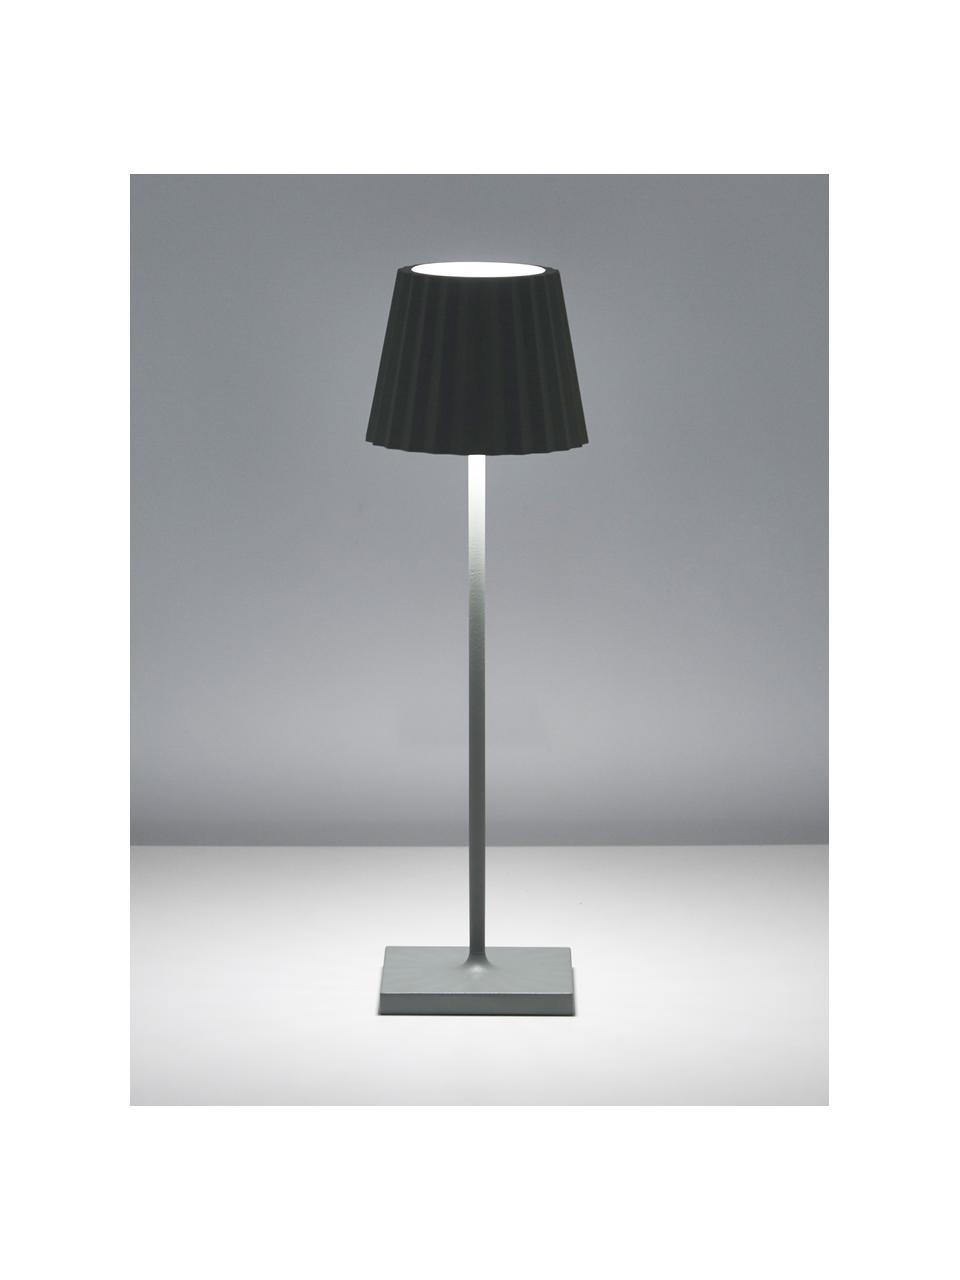 Mobile LED-Außentischleuchte Trellia, Aluminium, lackiert, Grün, Ø 15 x H 38 cm